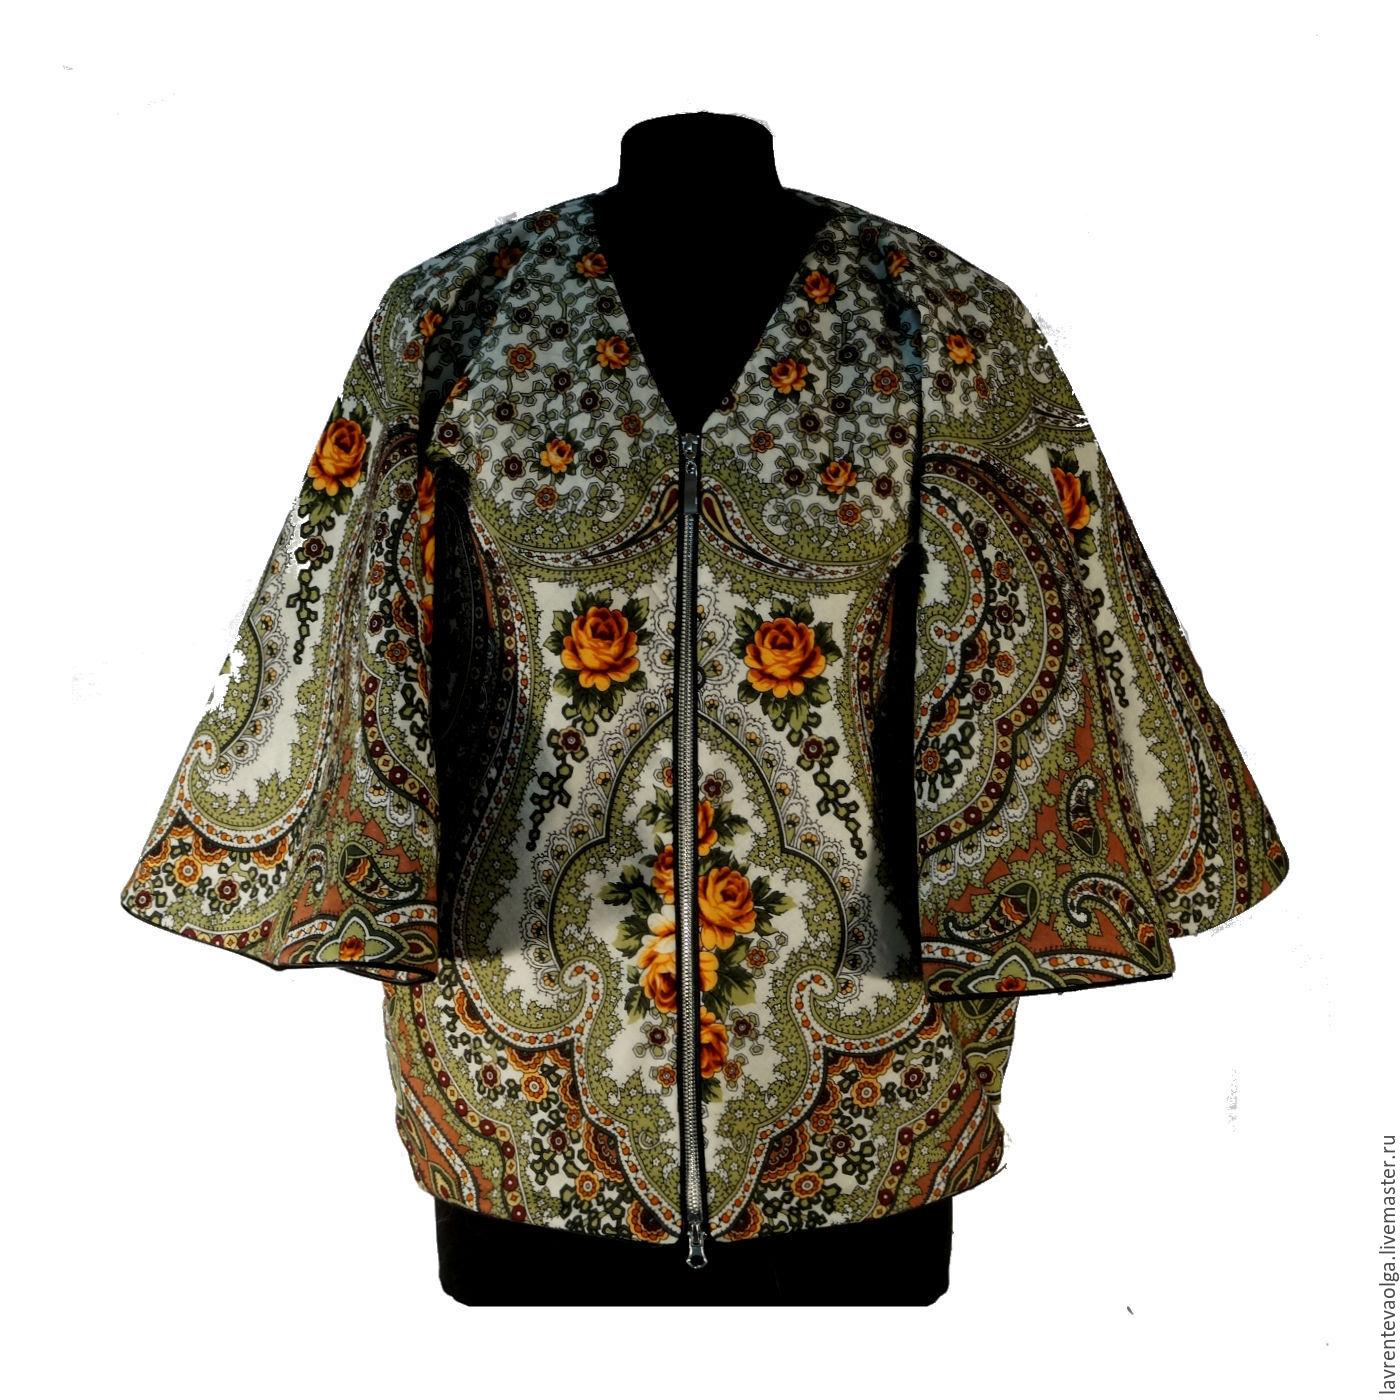 Designer jacket from pavlovoposadskaja shawl 'Fairy of Lilac', Outerwear Jackets, Moscow,  Фото №1